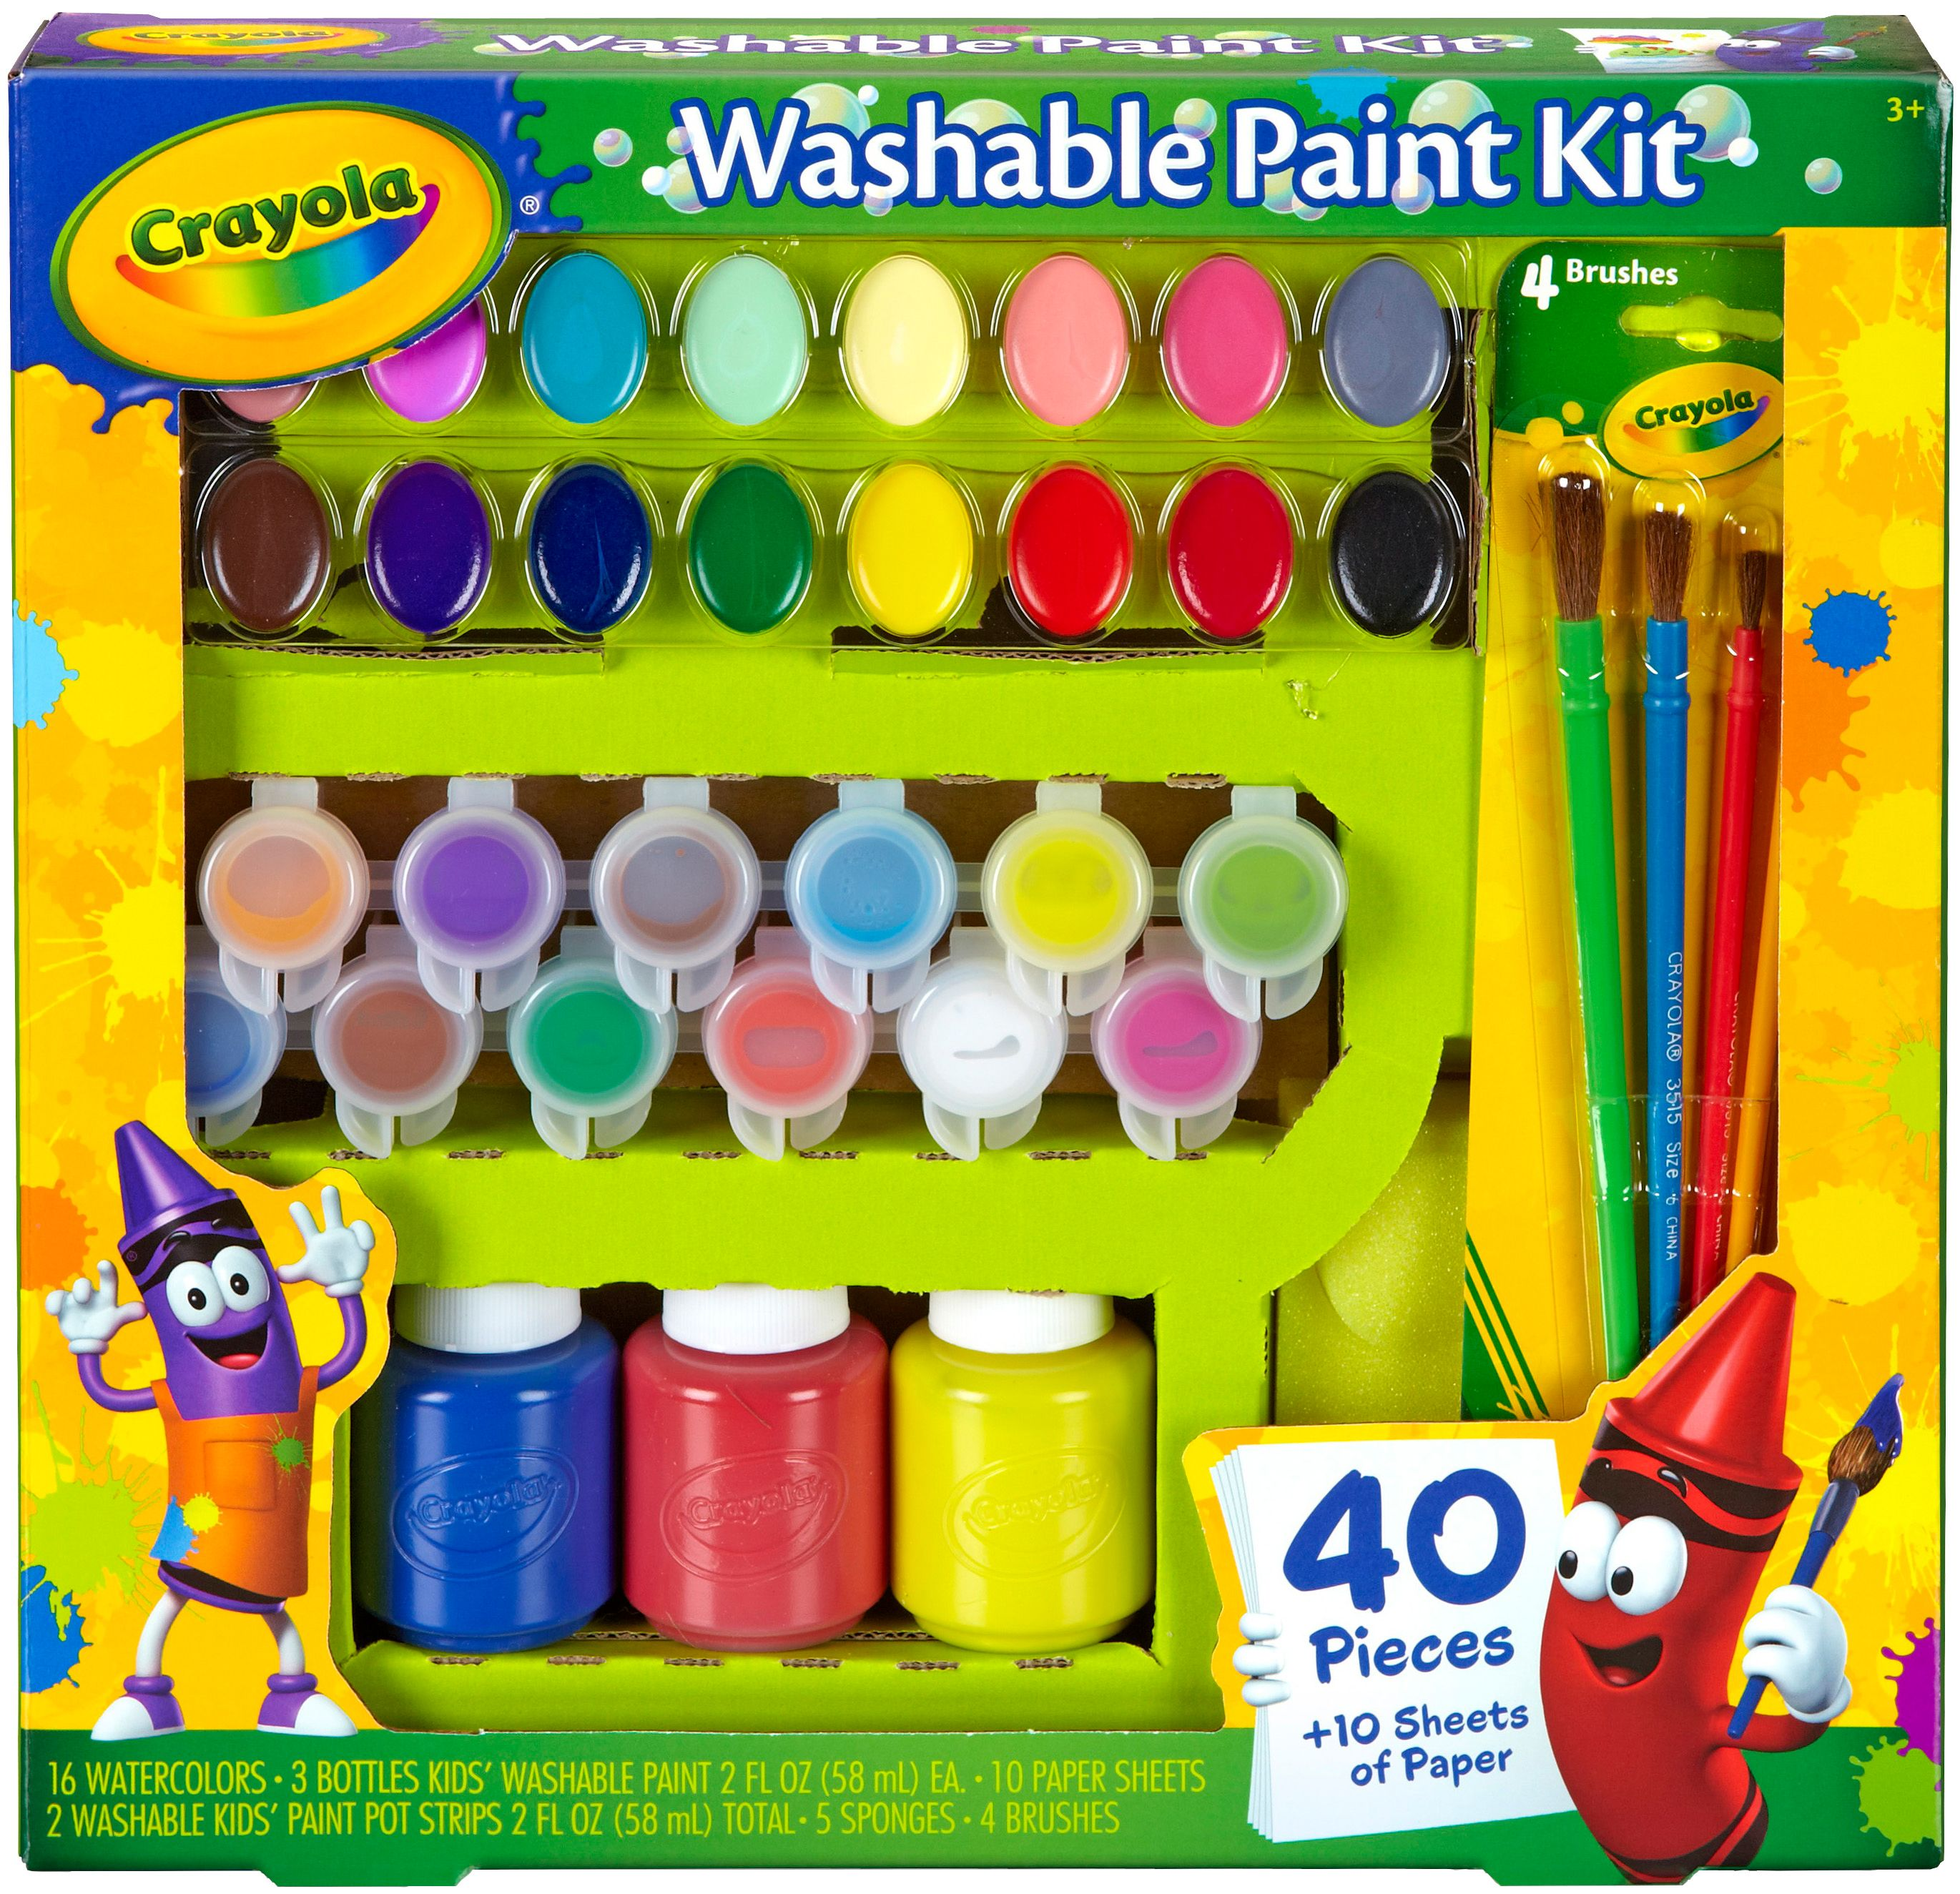 Crayola Washable Paint Kit - Walmart.com